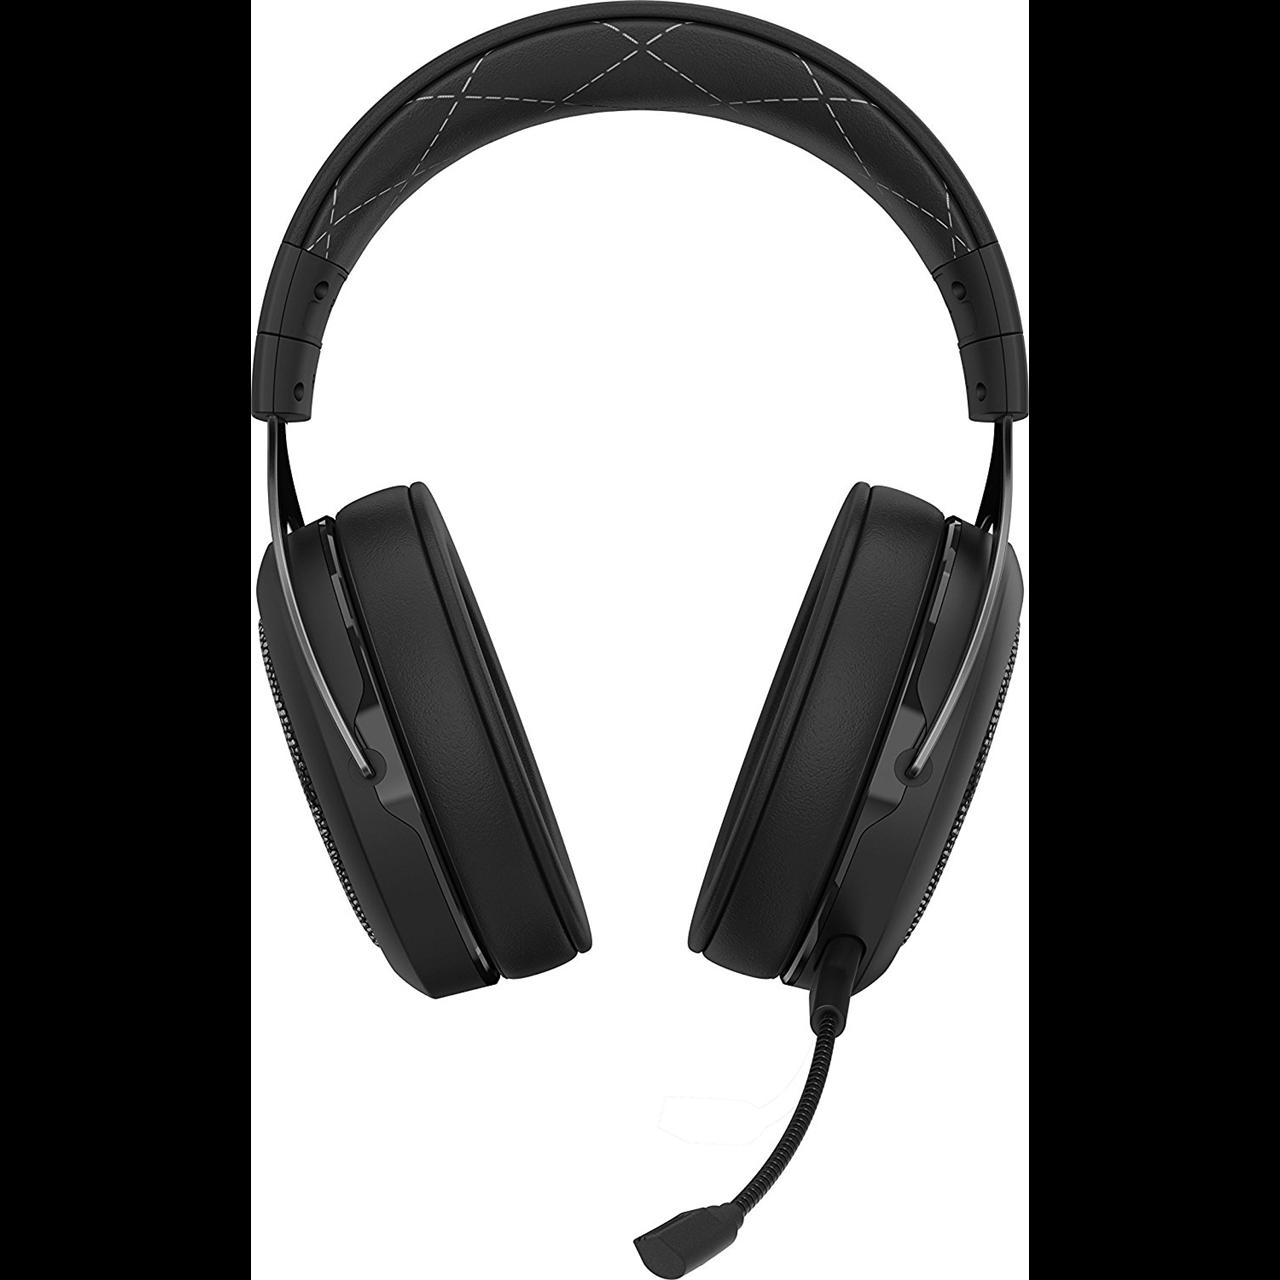 Headset Corsair Gaming HS70 wireless - carbon - DaxStore S.R.L.S. 1d5cd7c54077